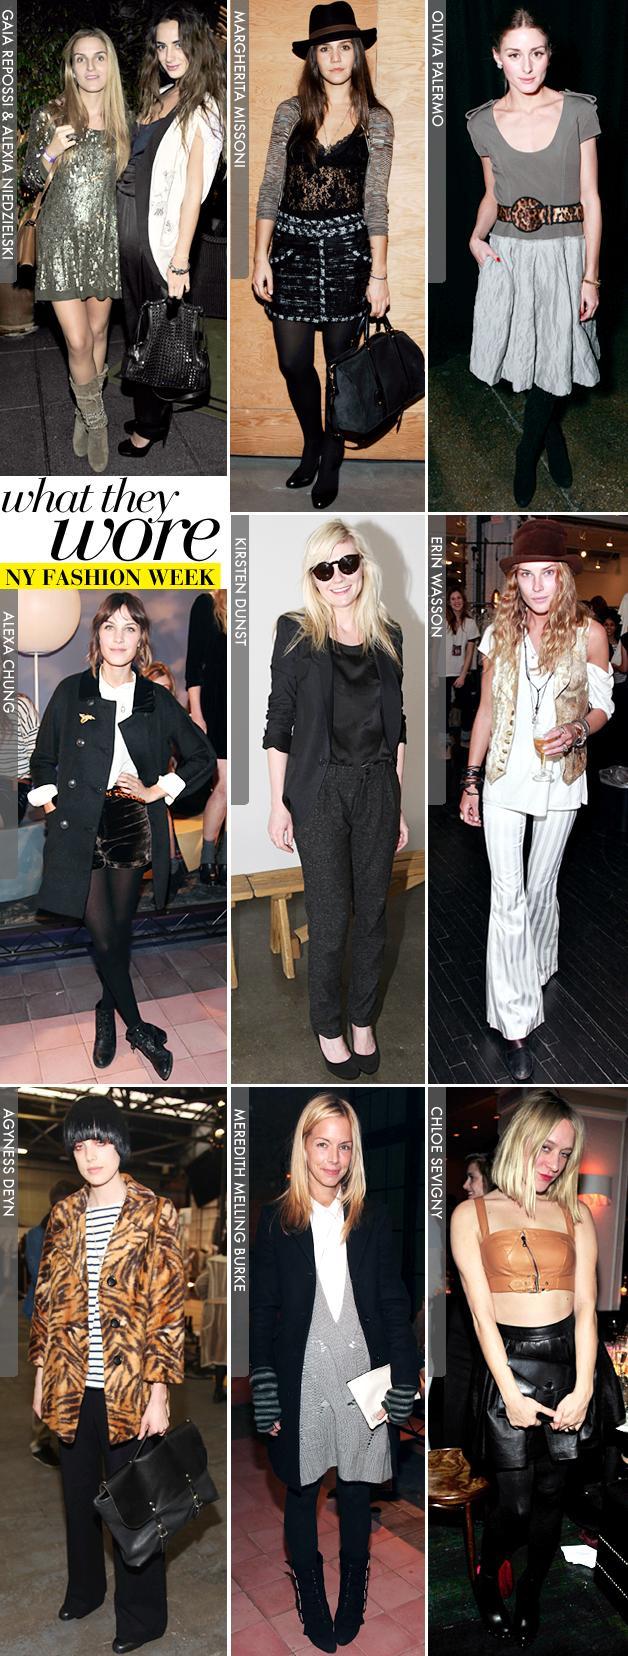 New York Fashion Week: Part One